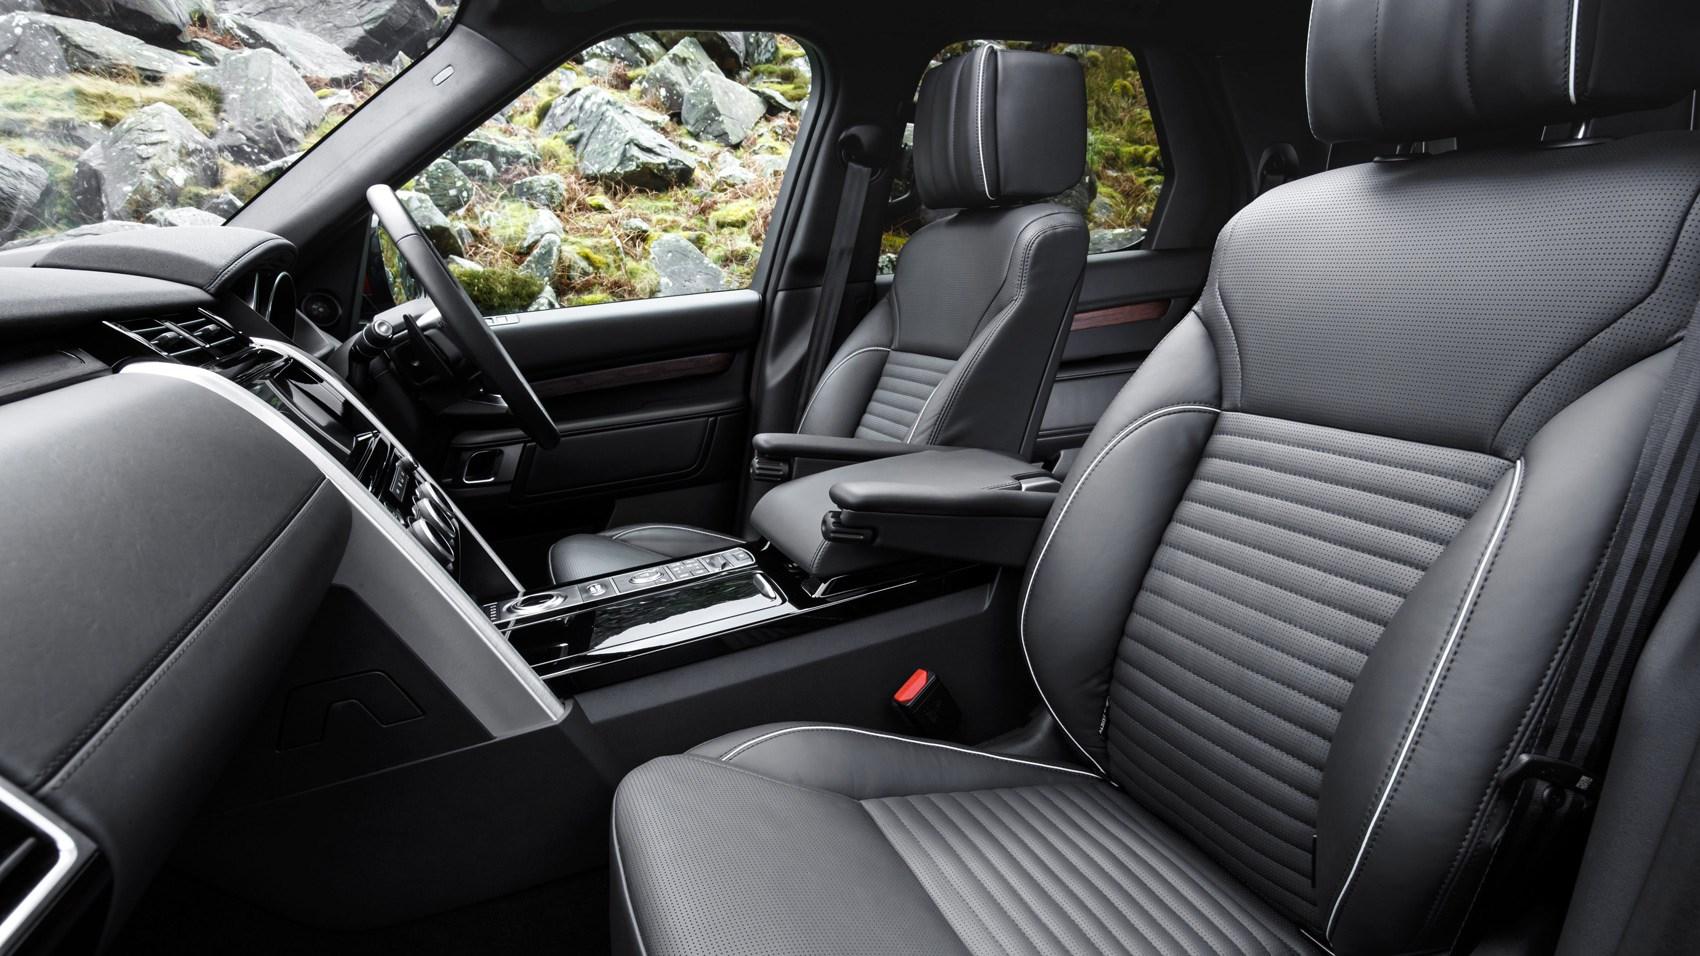 Land Rover Discovery sD4 interior